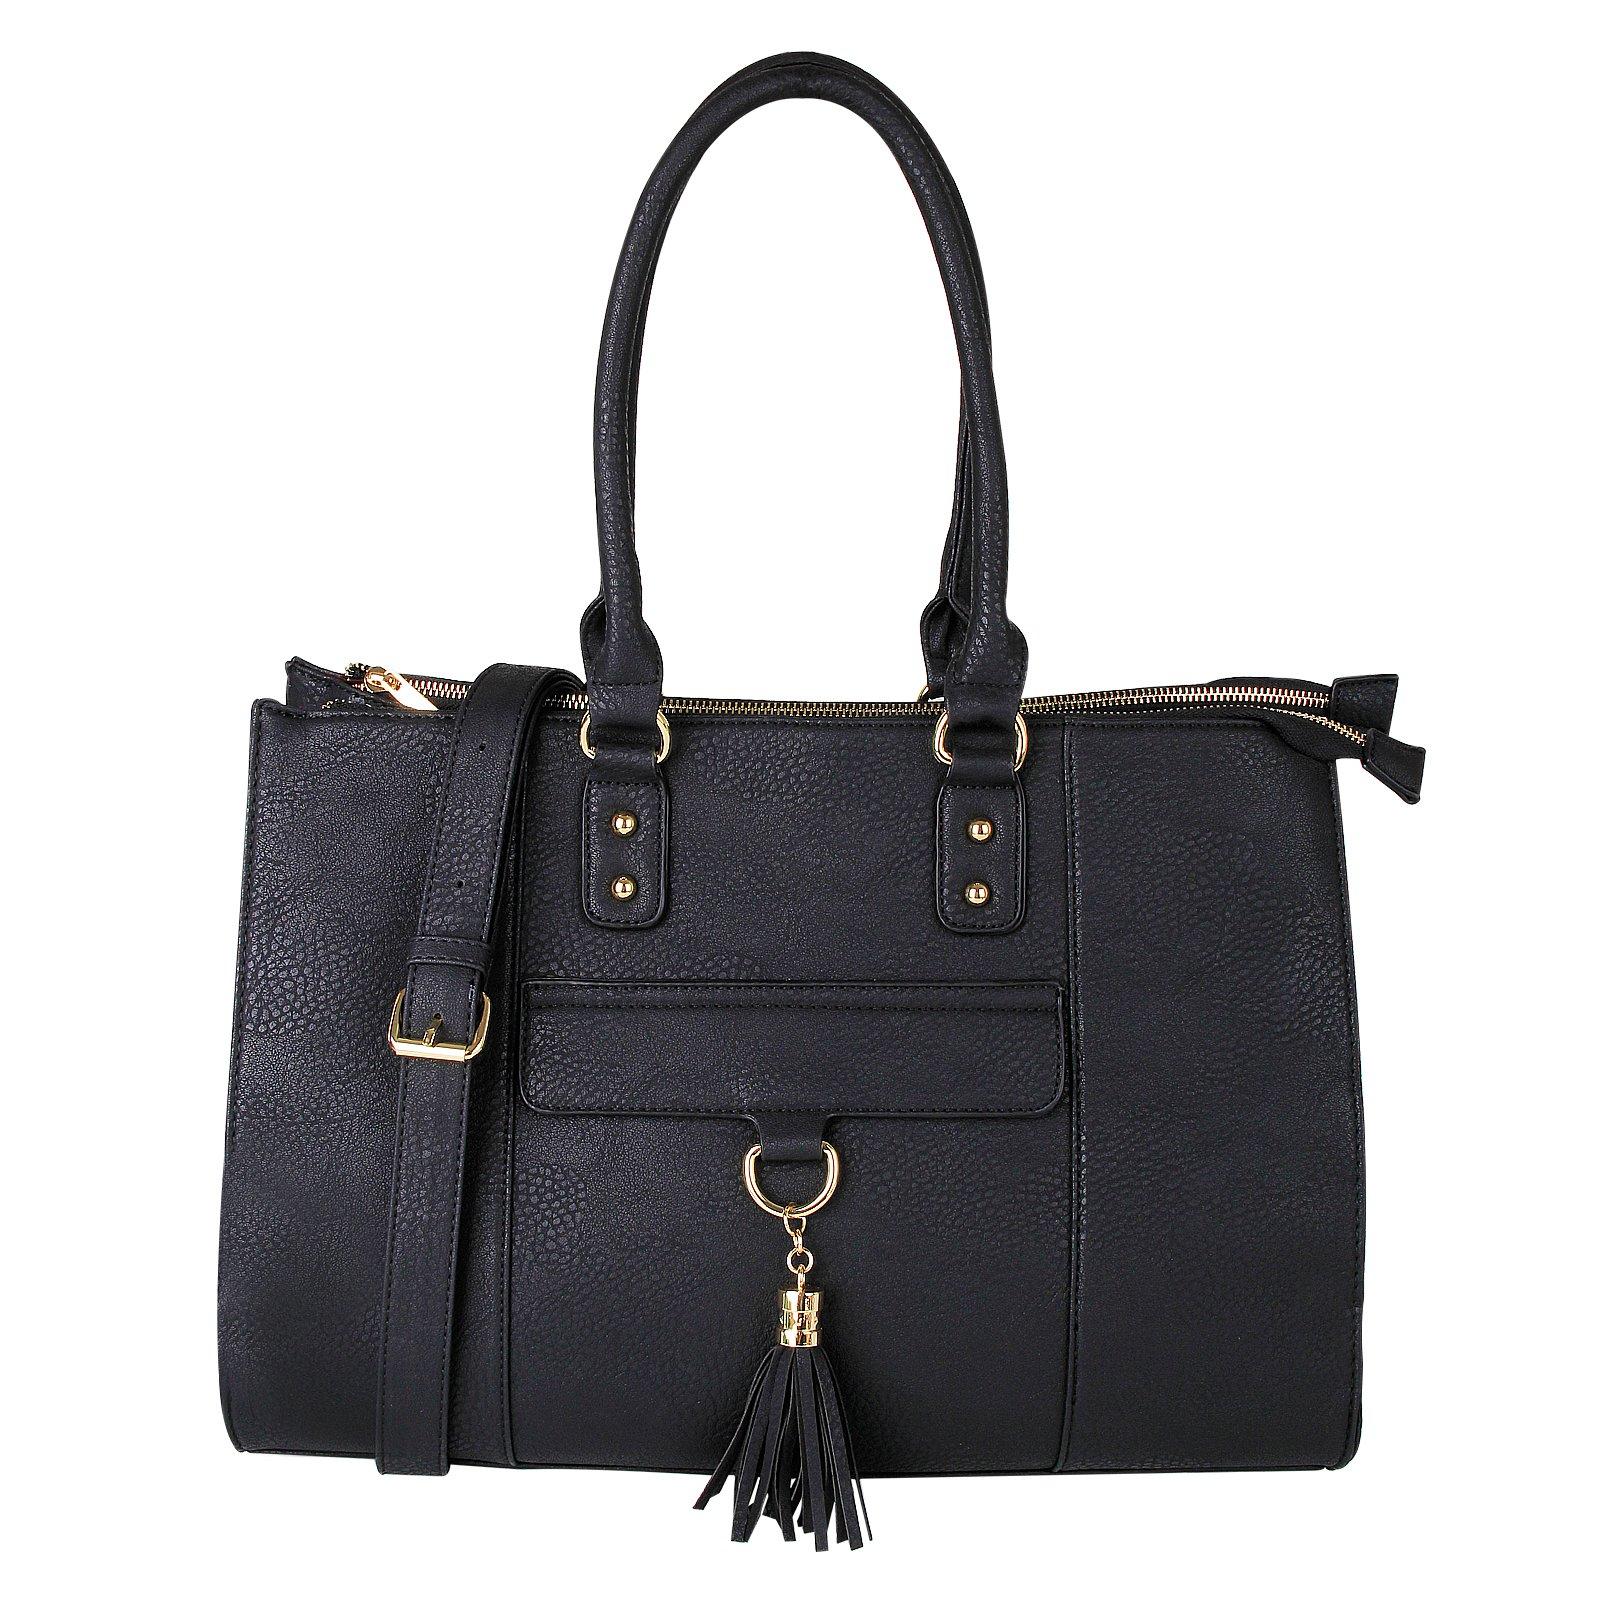 Eva & Evan 2018 New Women Satchel Handbags Shoulder Bag with Tassels Top Handle Large PU Leather Adjustable Strap Black